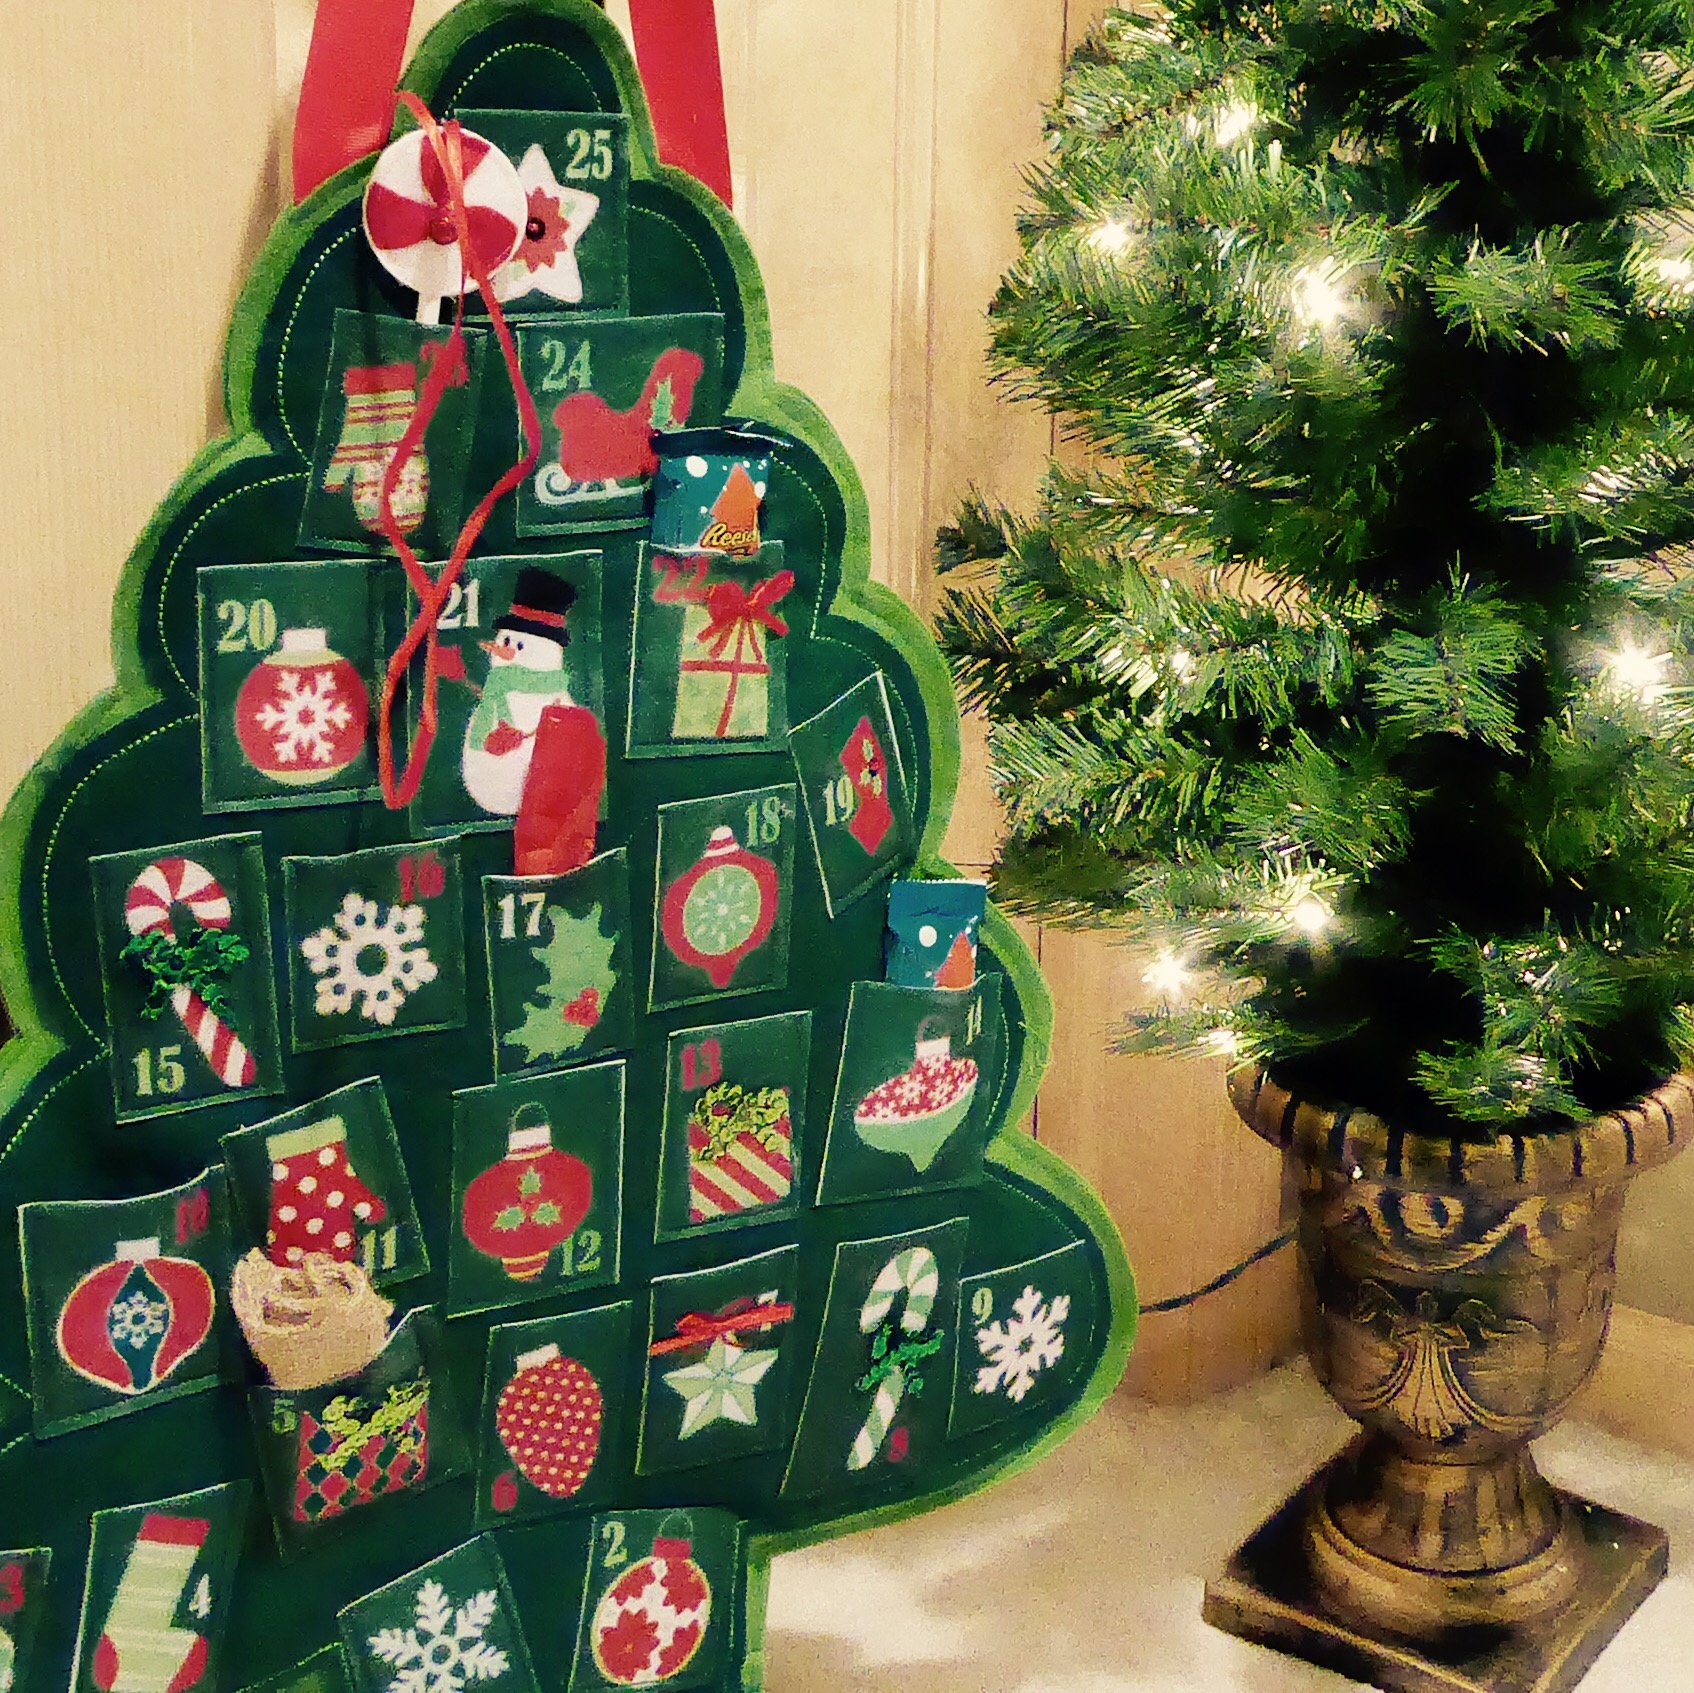 Advent Calendar Door Decor: Holiday Decor and Favorite